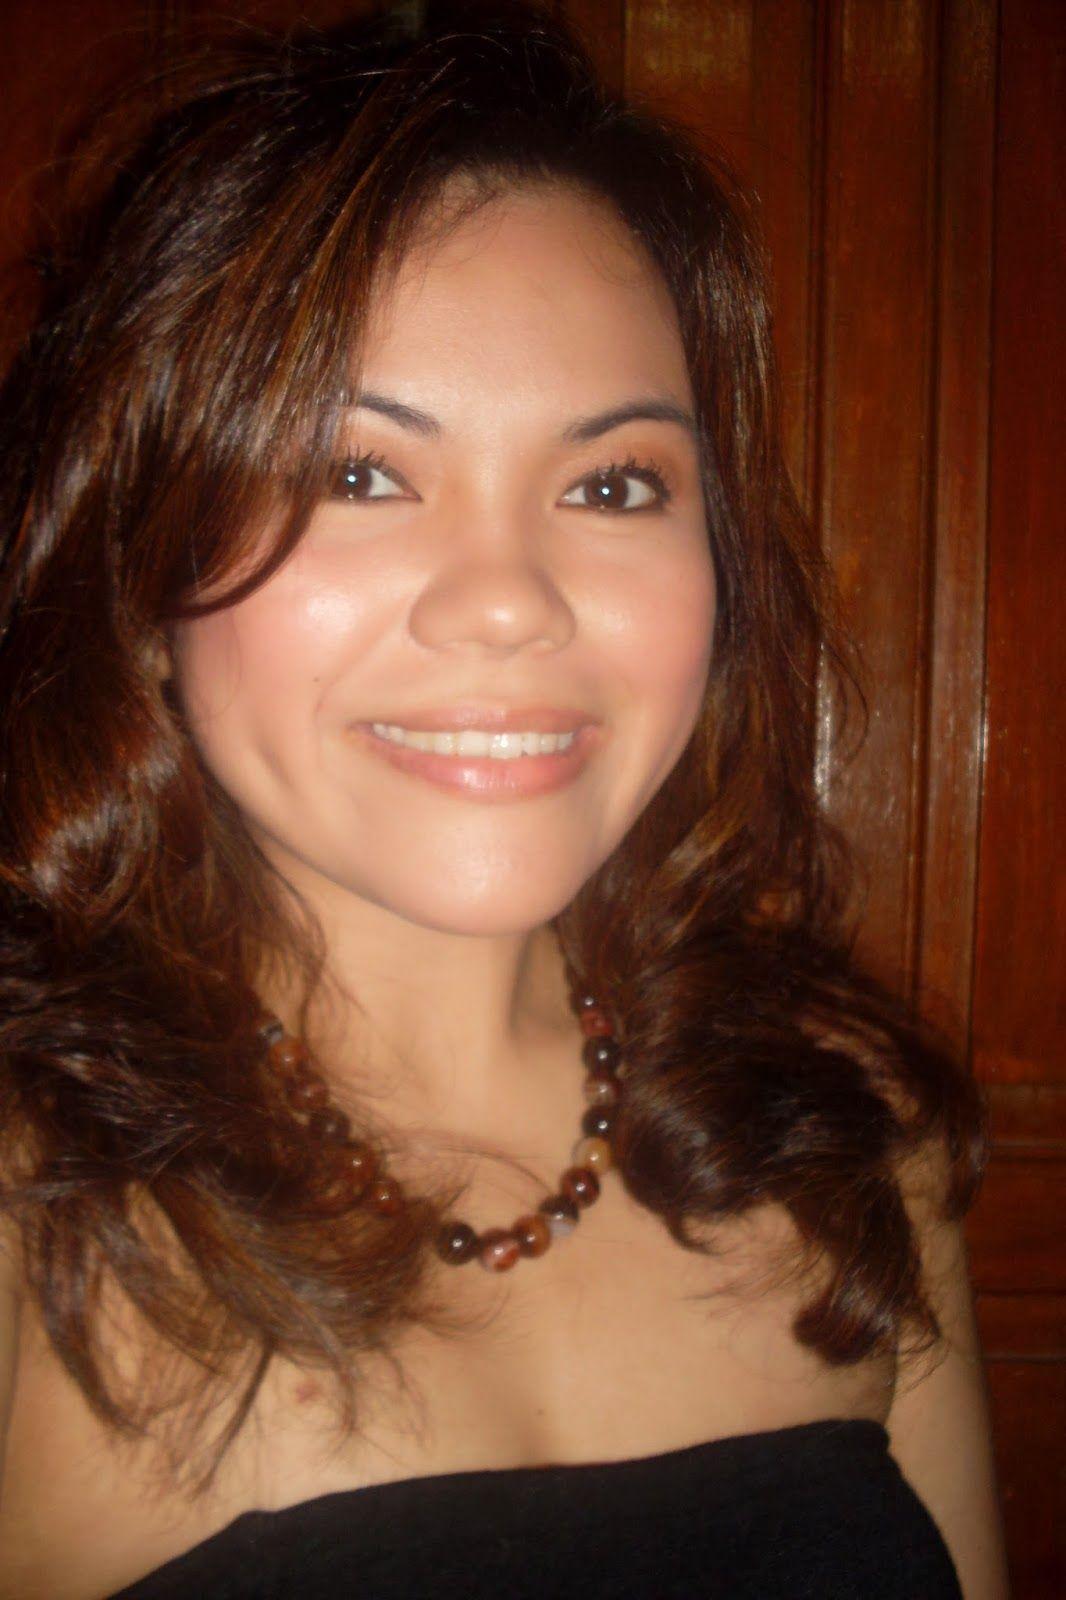 Filipina - 100% Free Filipino Women Dating App for Singles